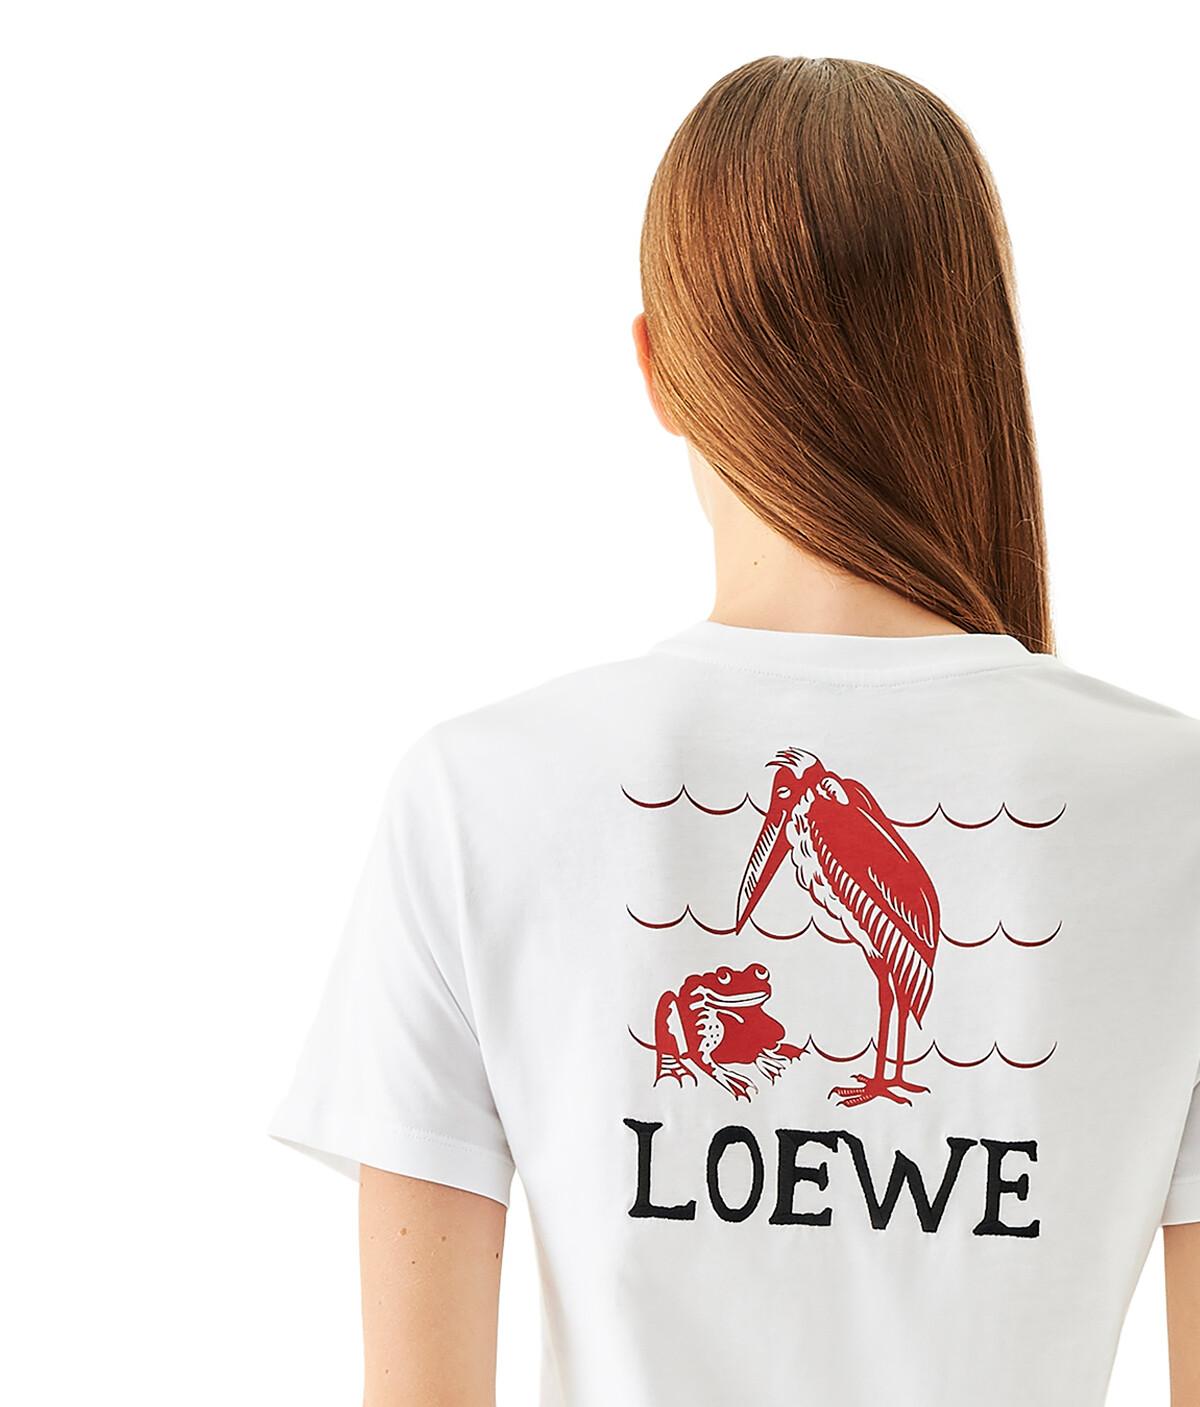 LOEWE T-Shirt Loewe Animals Embroidered White front